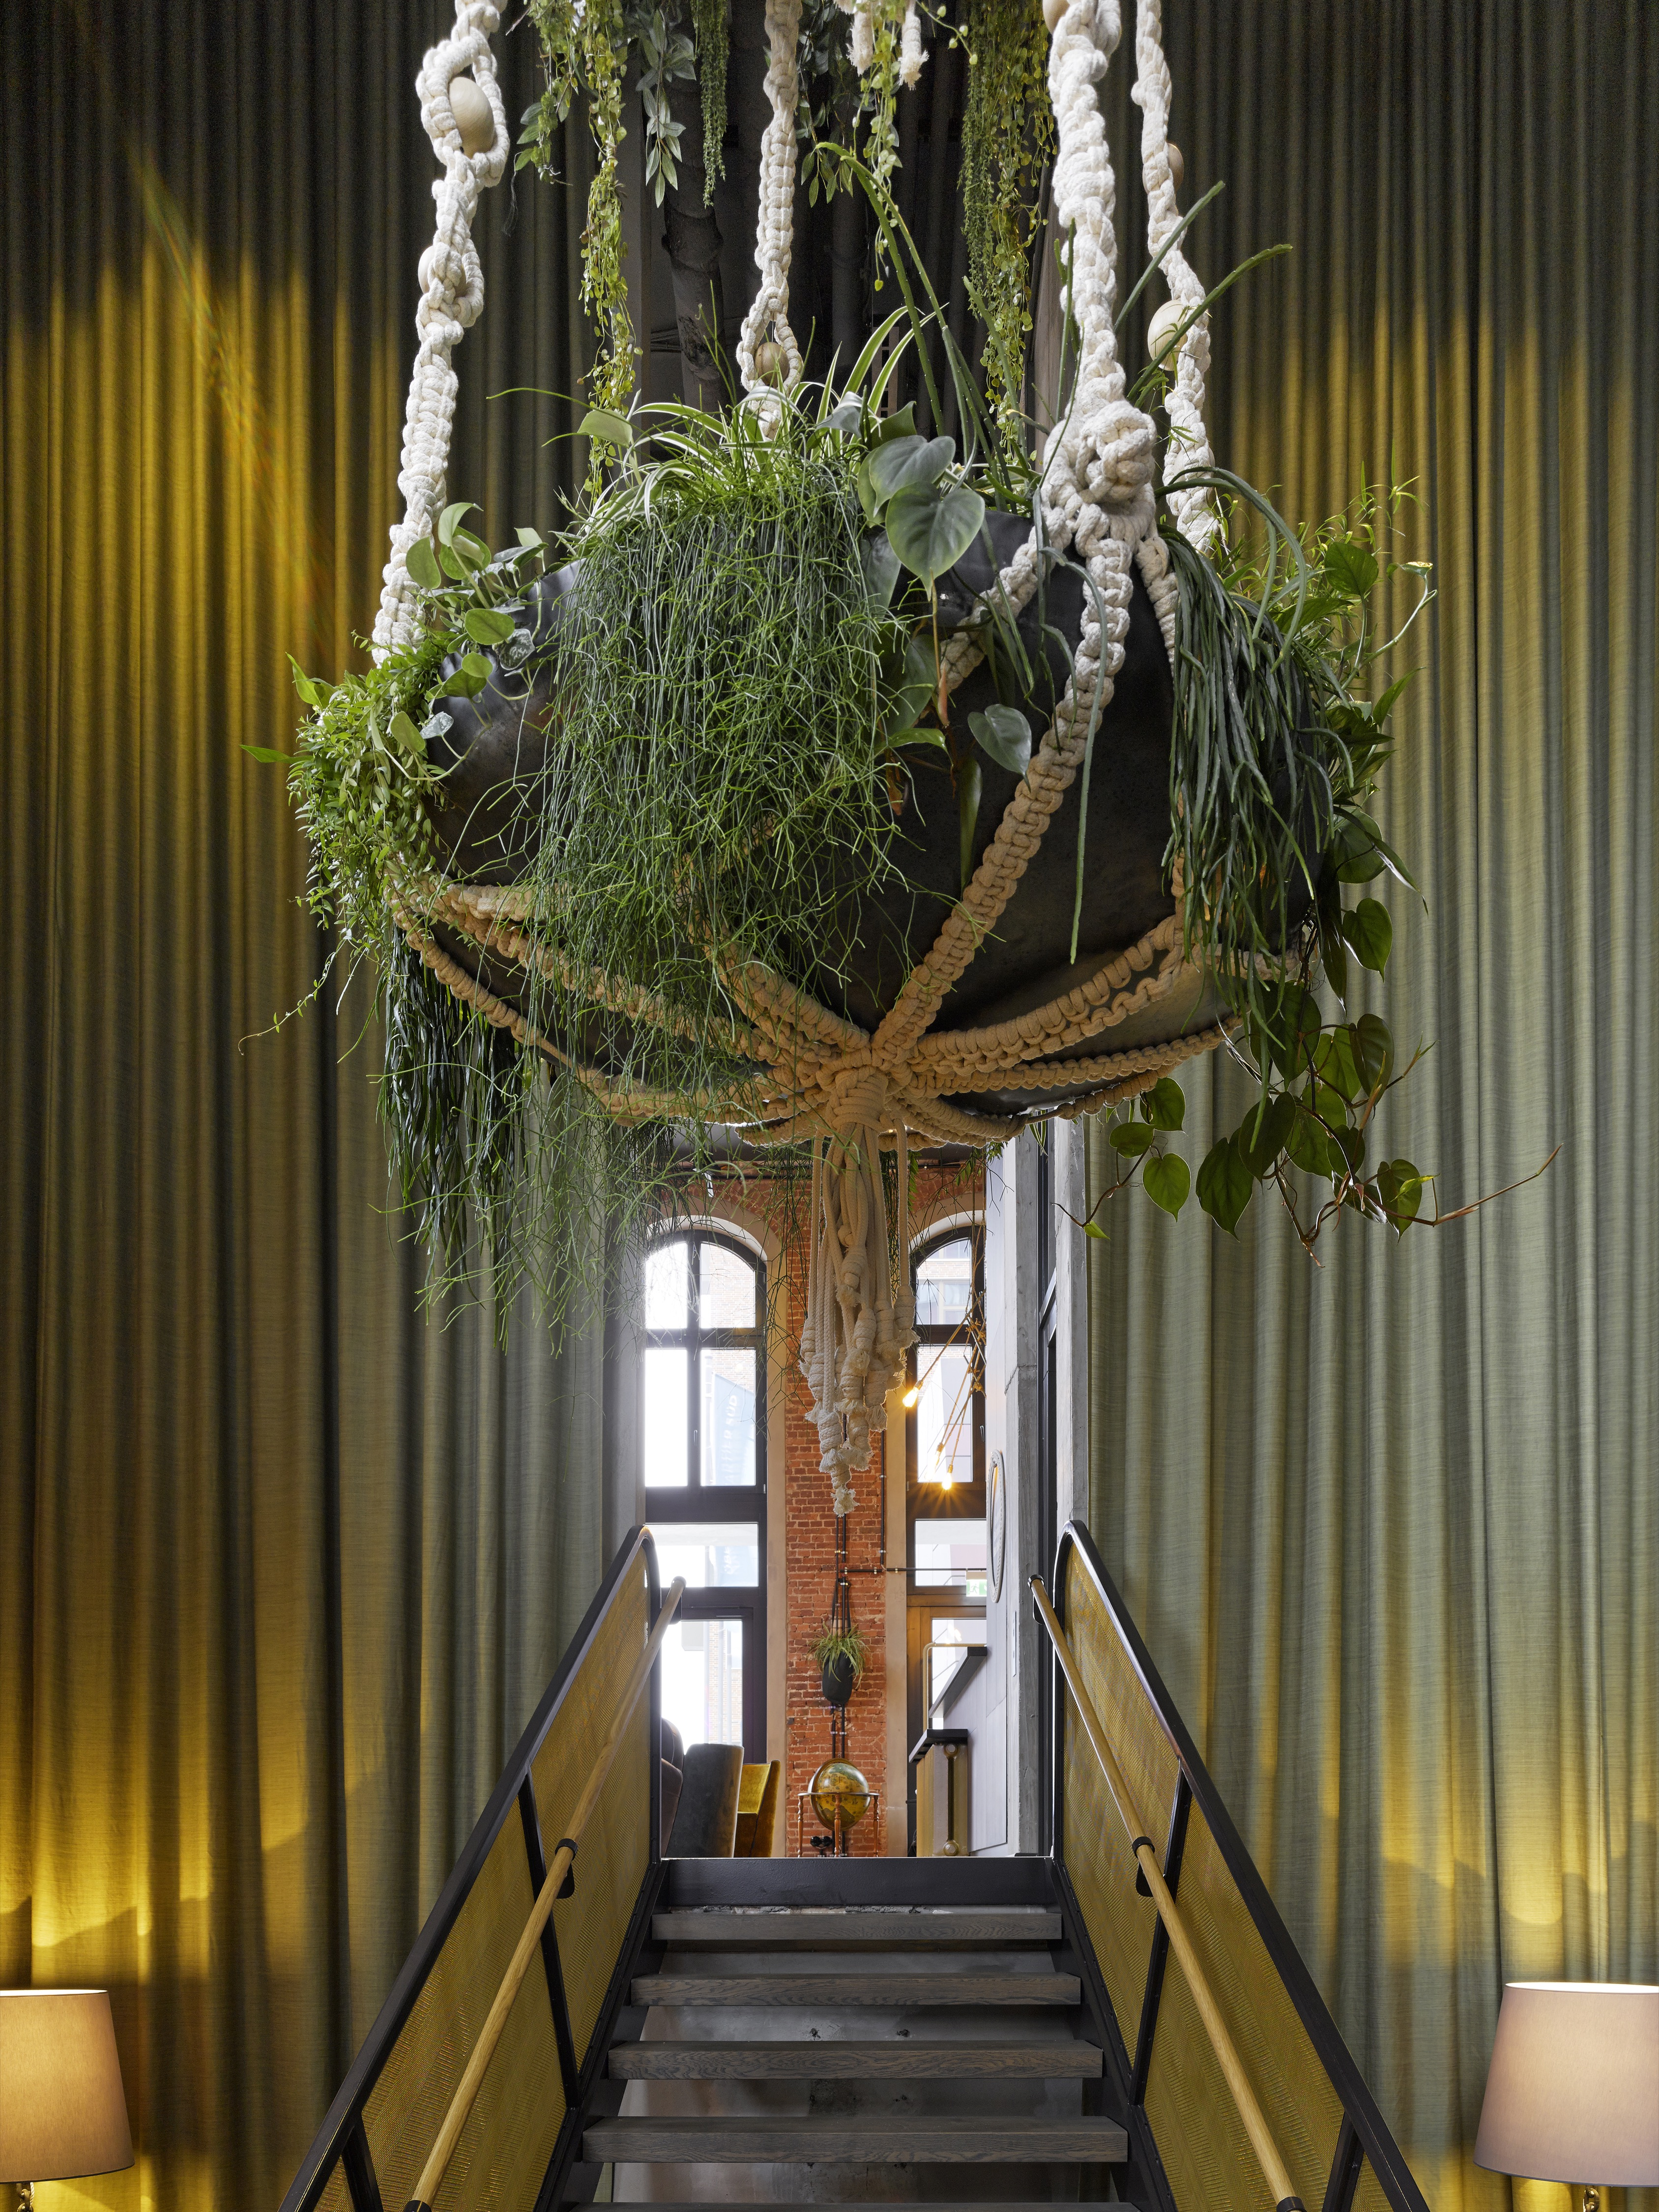 25hours_Hotel_Altes_Hafenamt_Blumenampel_gross-Megabambi